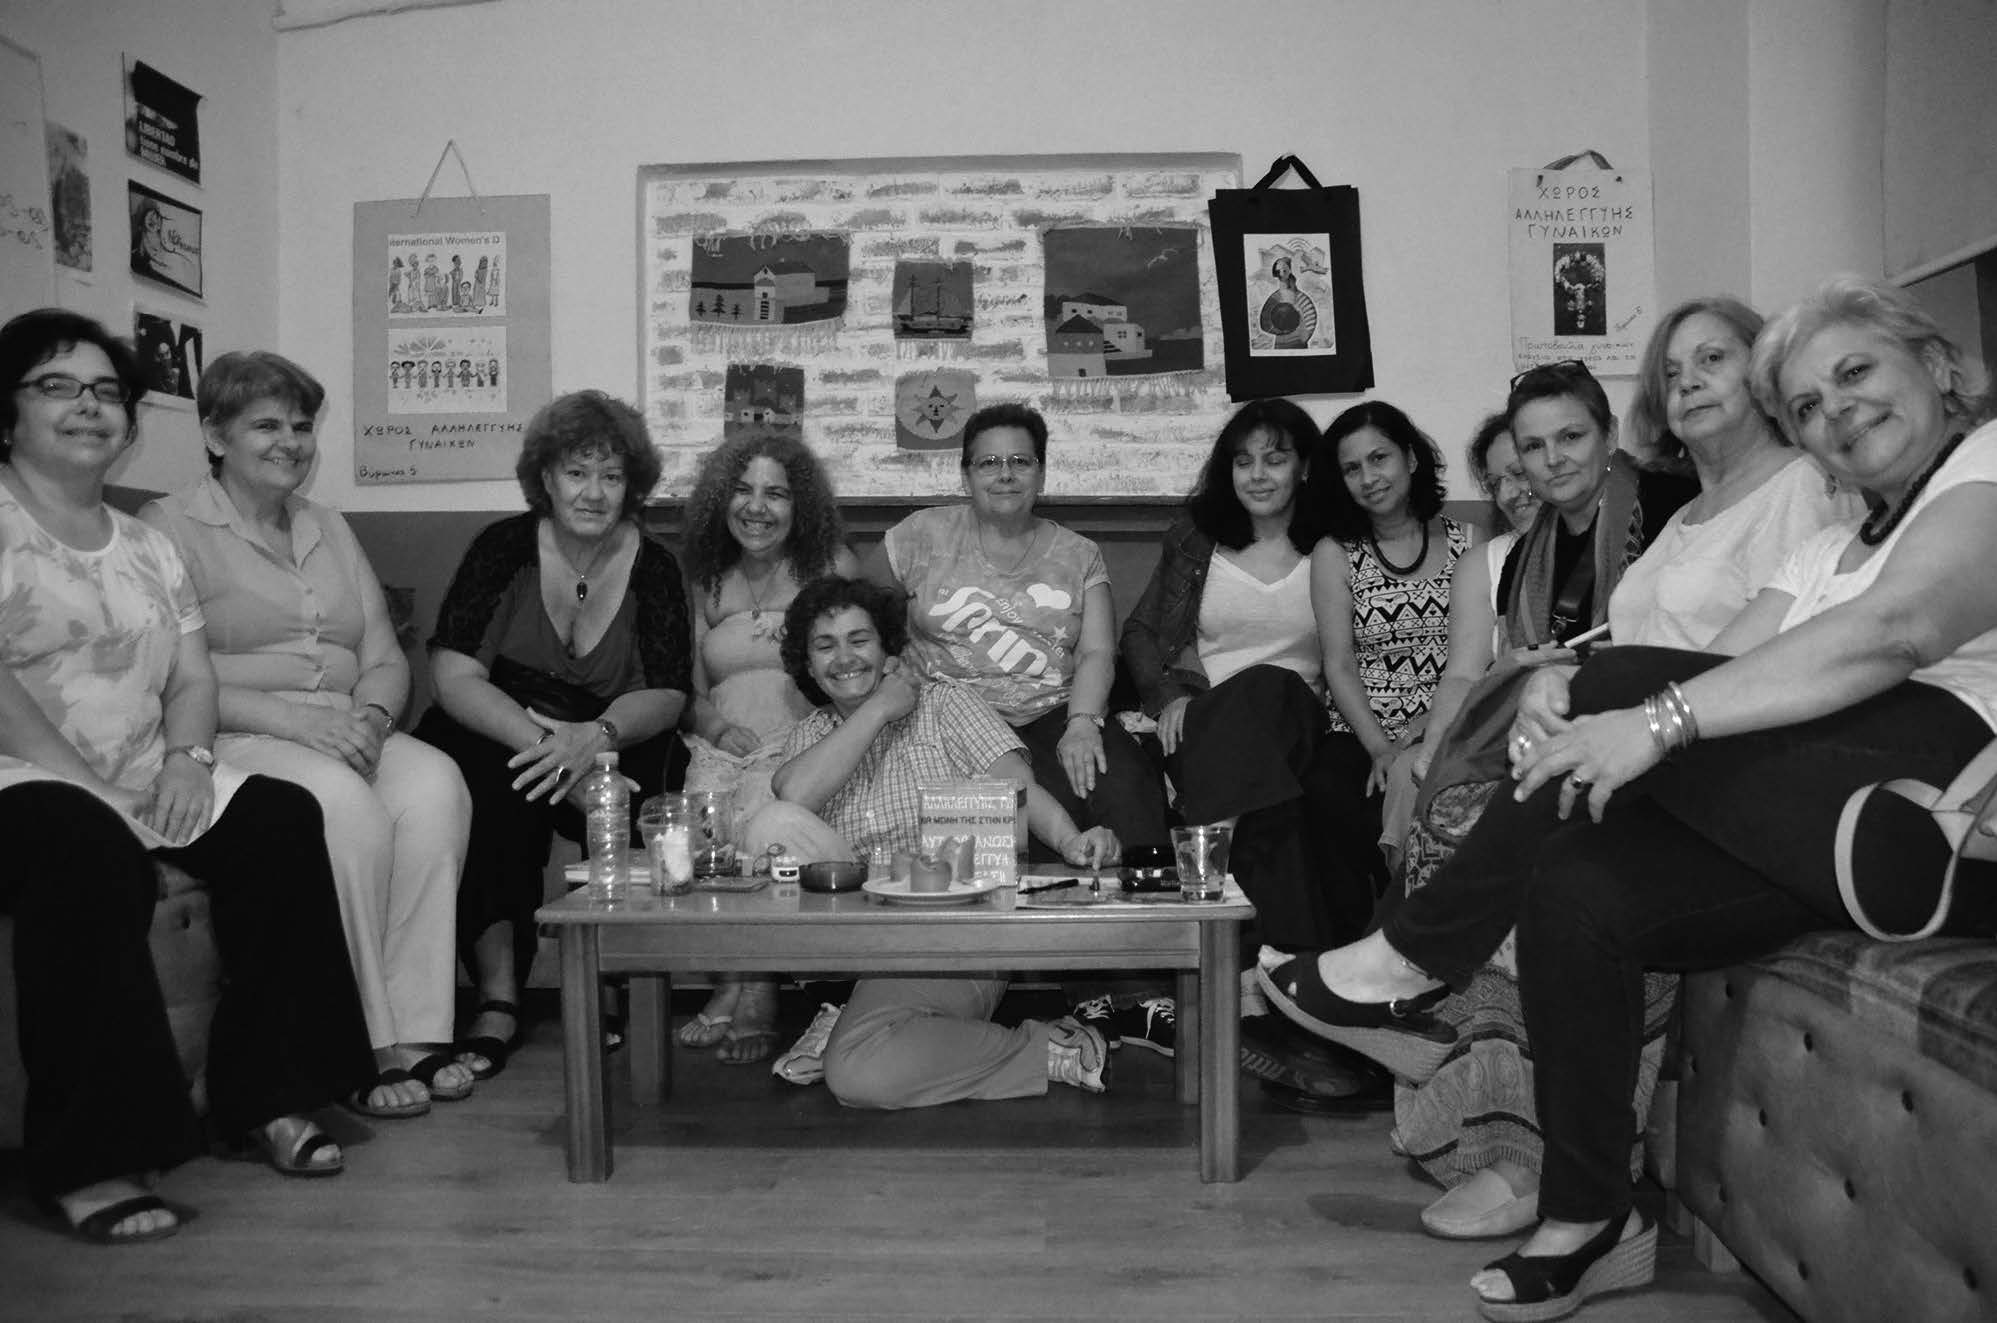 Women's Initiative Against Debt and Austerity Measures © Manuela Banoža